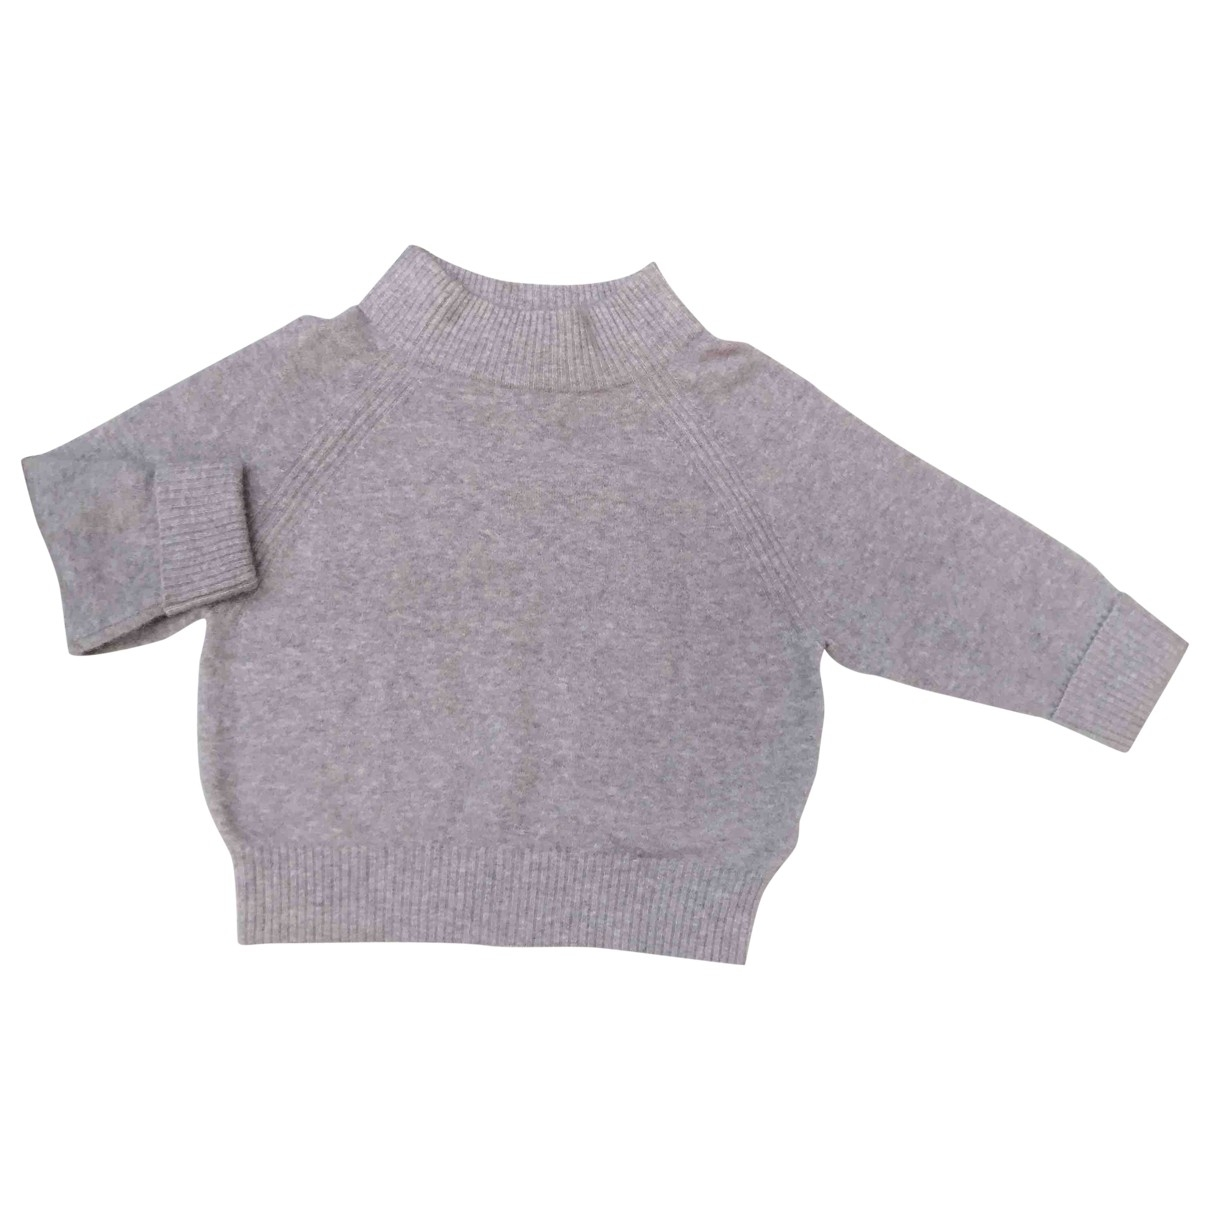 3.1 Phillip Lim \N Pullover in  Grau Wolle